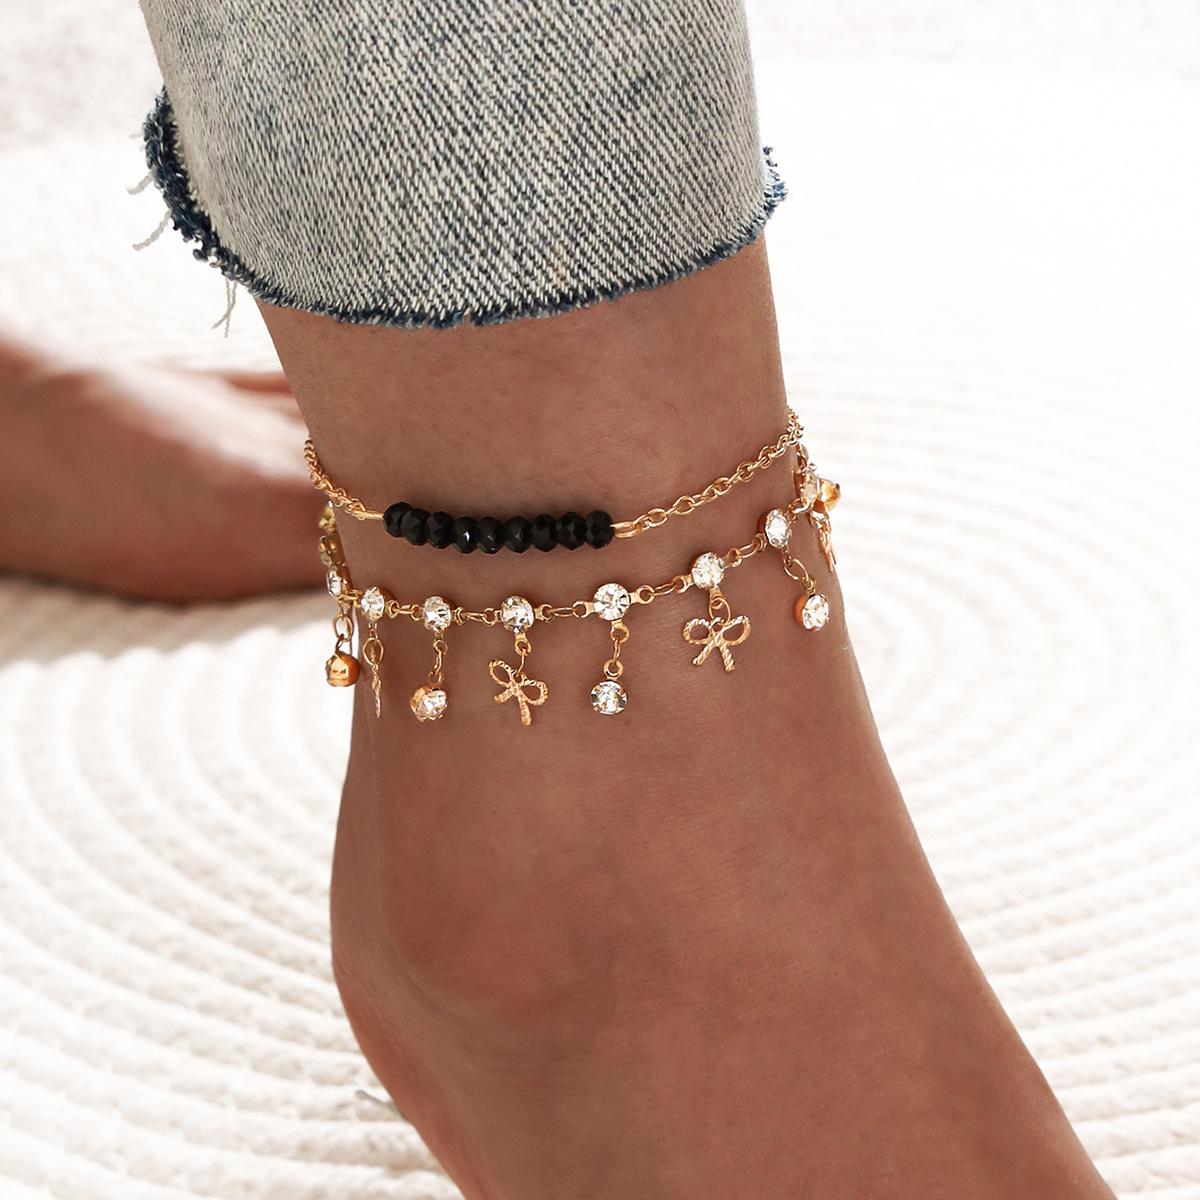 new hand-stranded black beads artificial diamond rhinestone bowknot tassel alloy anklet 2-piece set NHPV243730